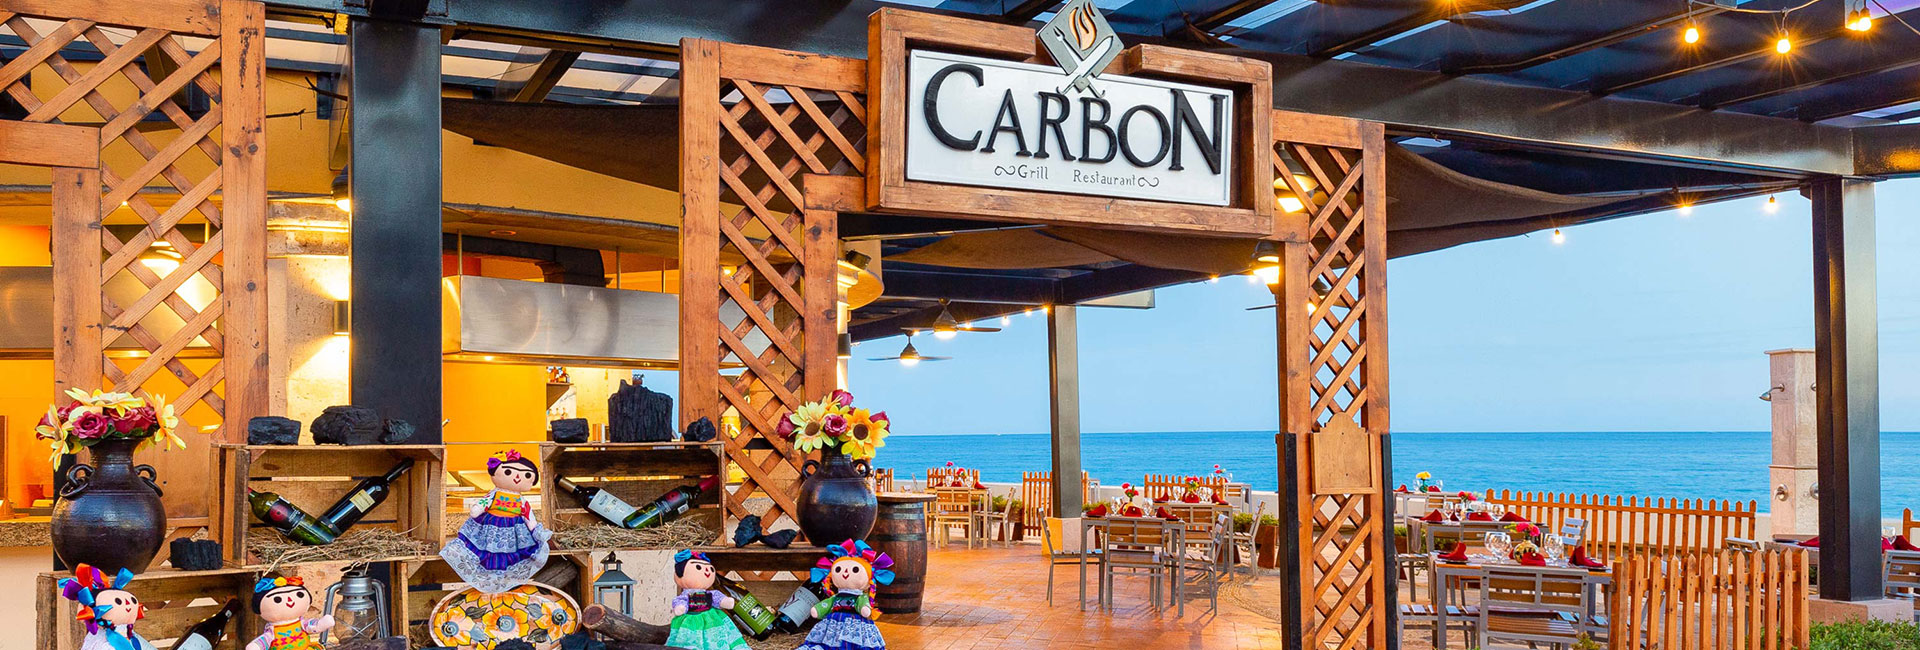 Carbon grill restaurant